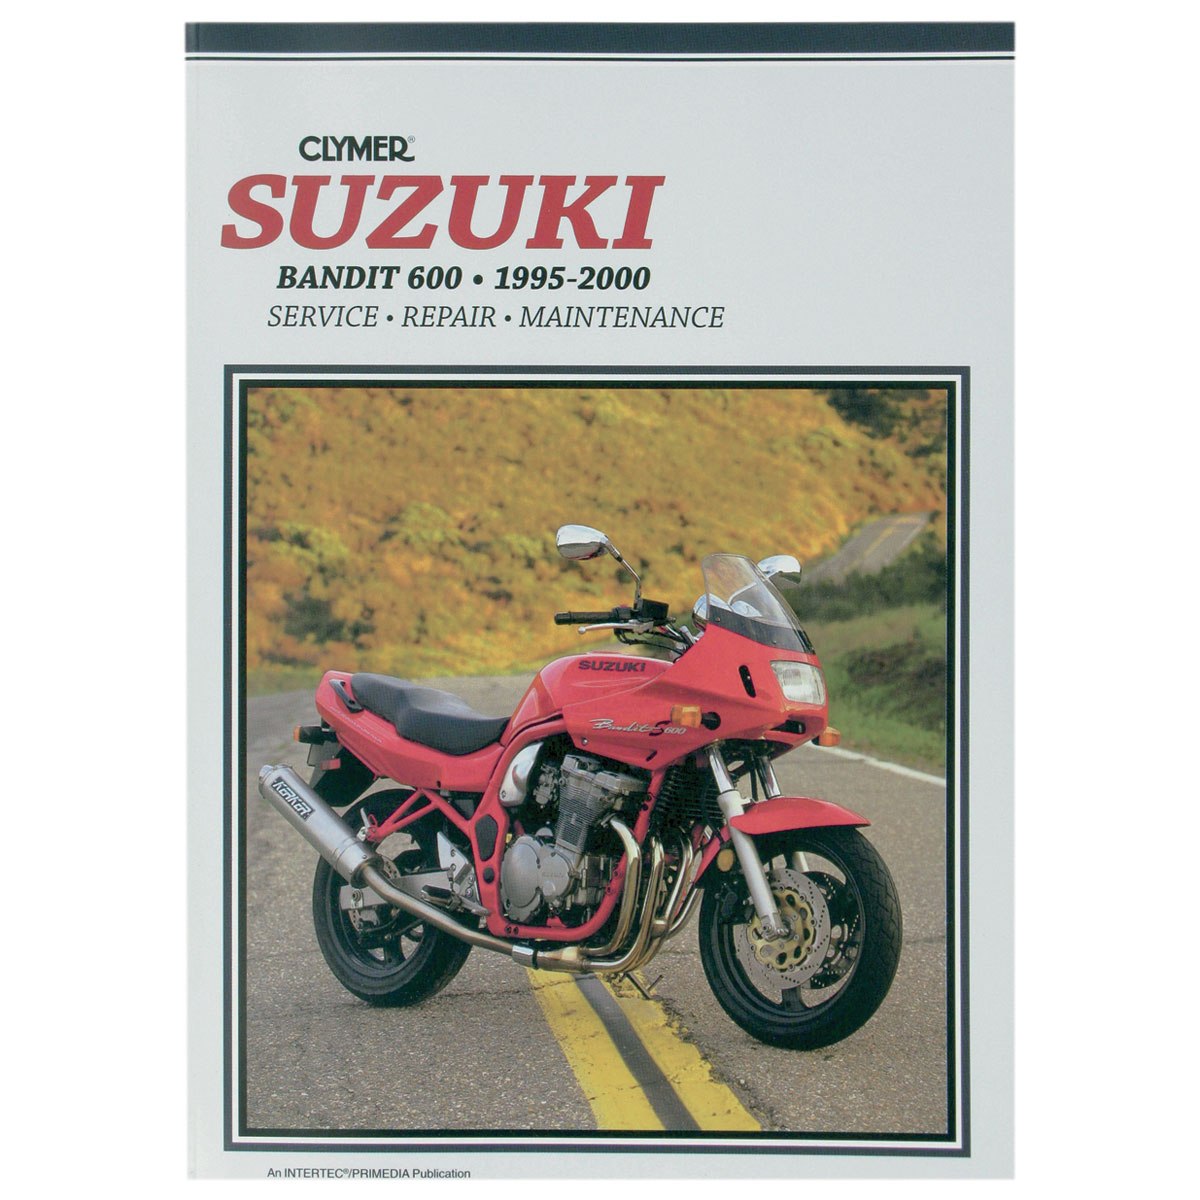 Clymer Suzuki Motorcycle Repair Manual - M338